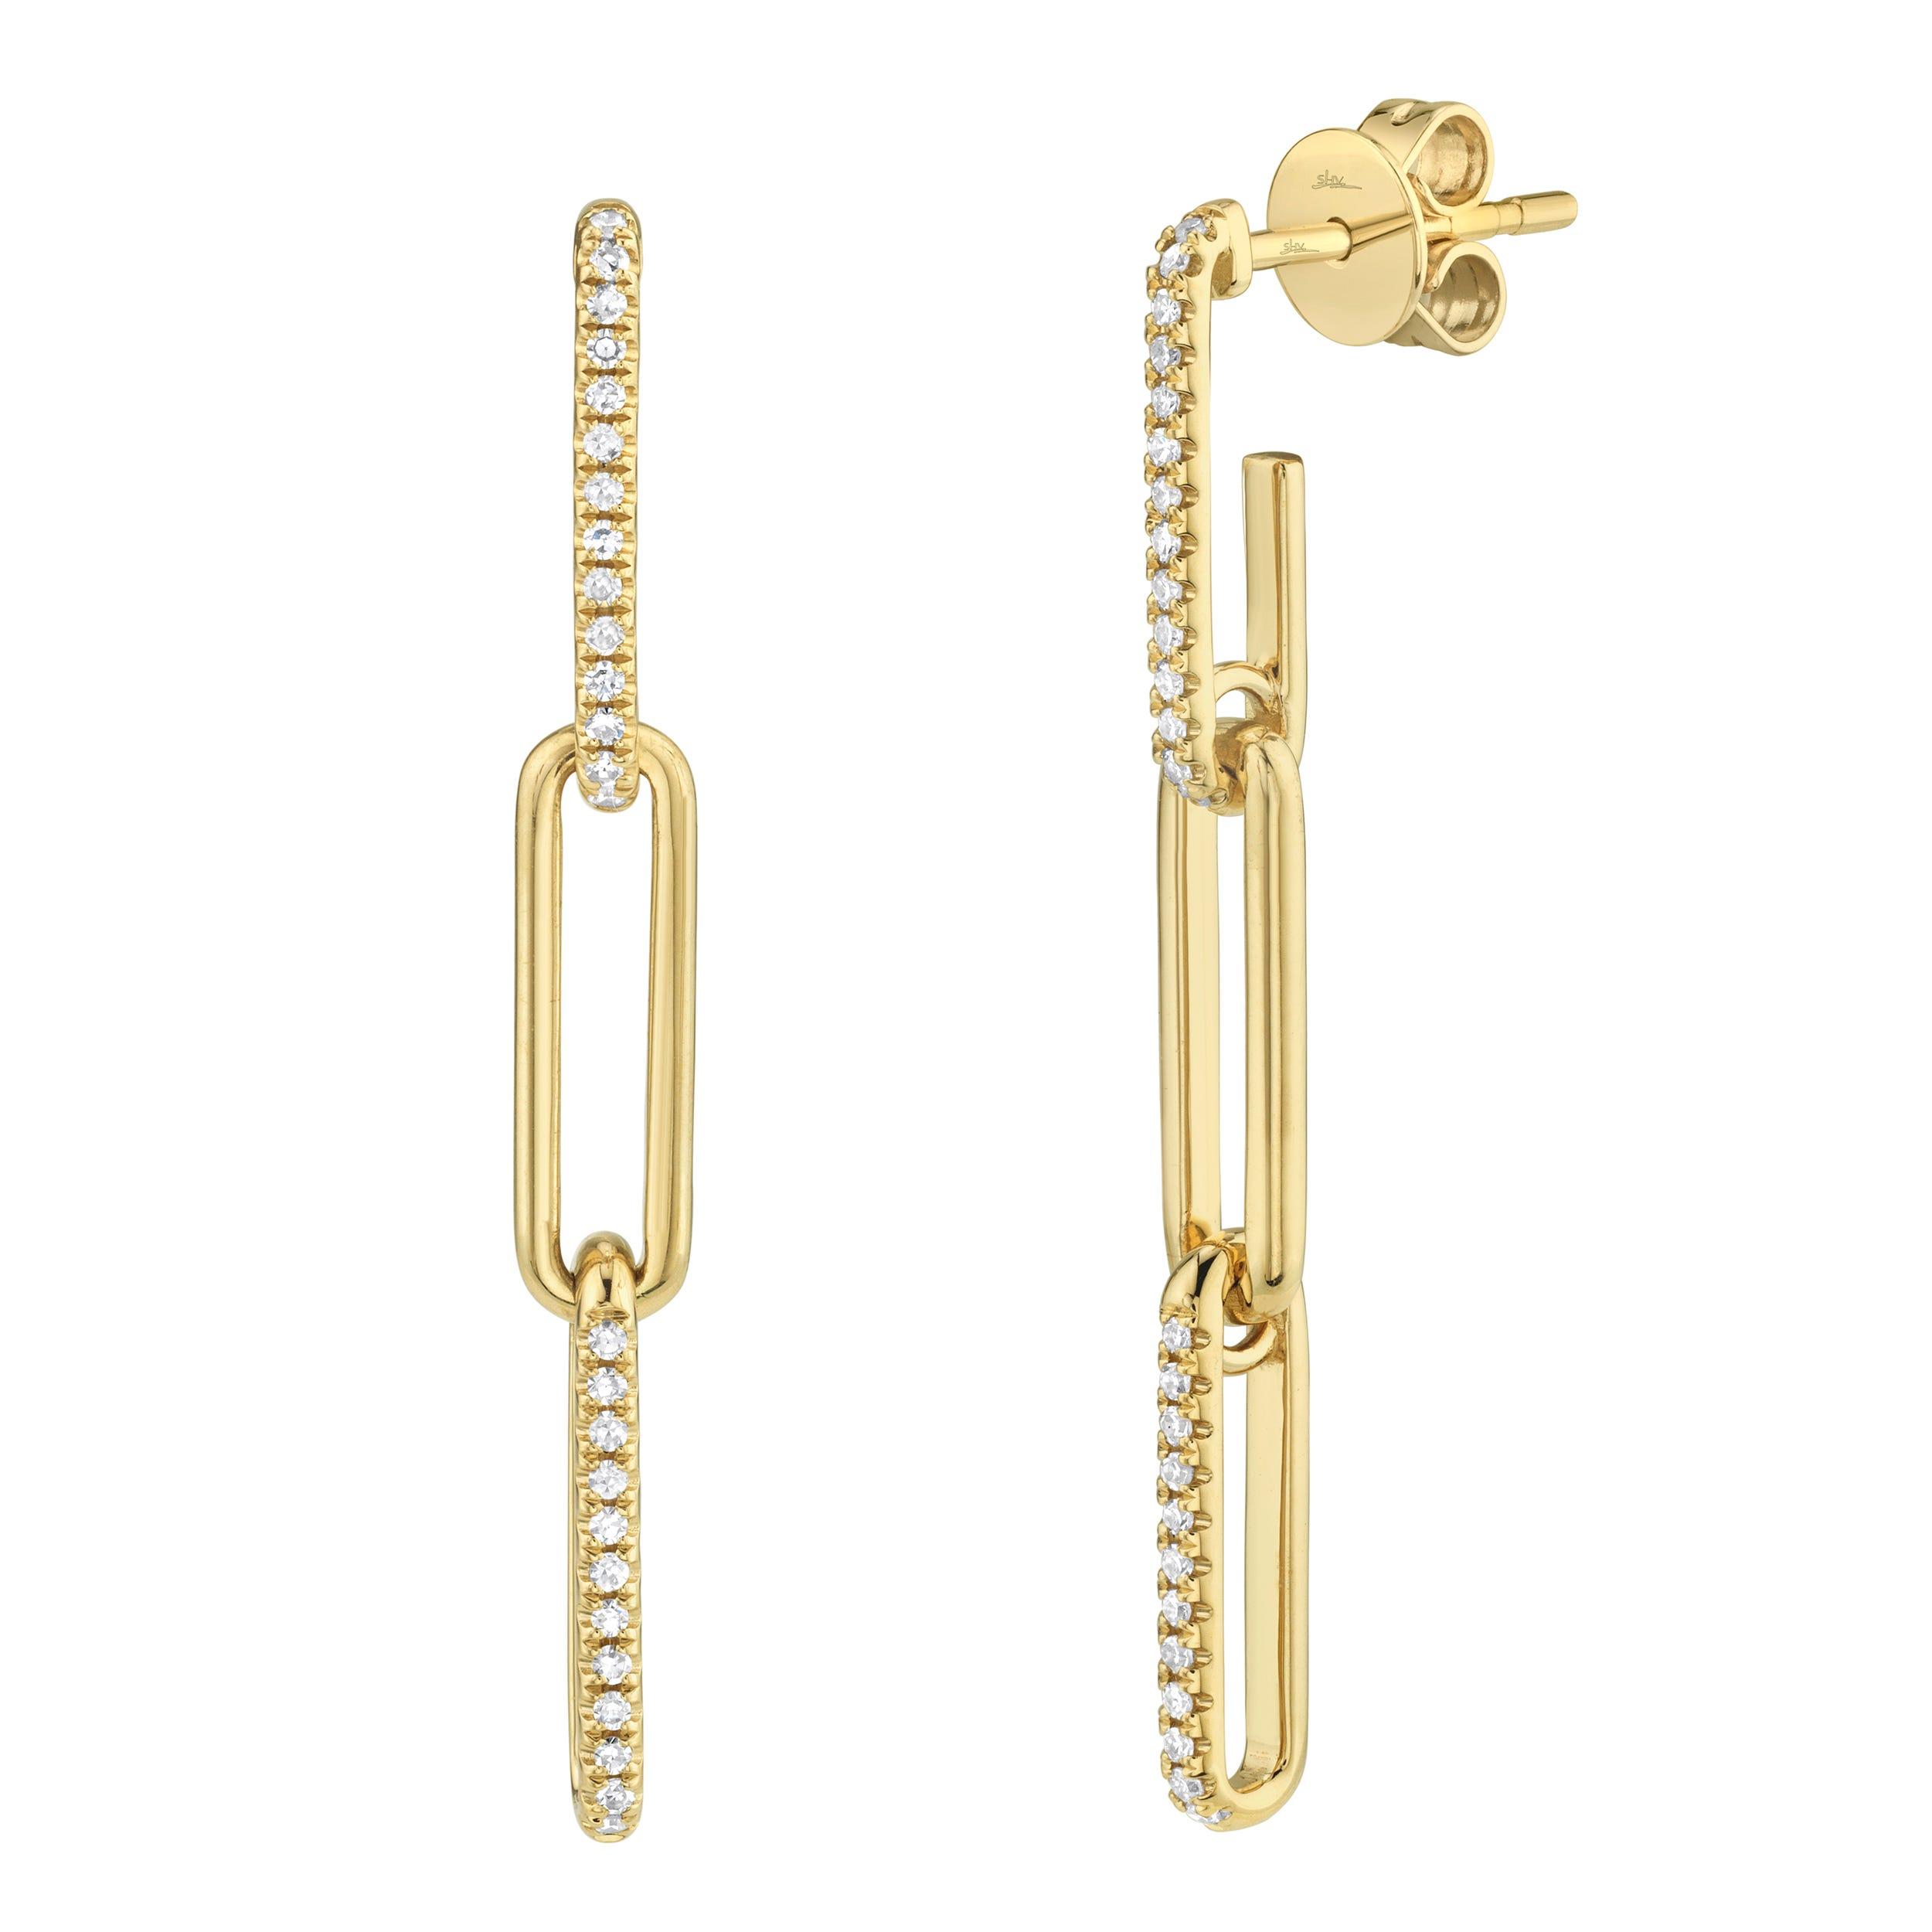 Shy Creation 0.17ctw. Diamond Paperclip Dangle Earrings in 14k Yellow Gold SC55009644